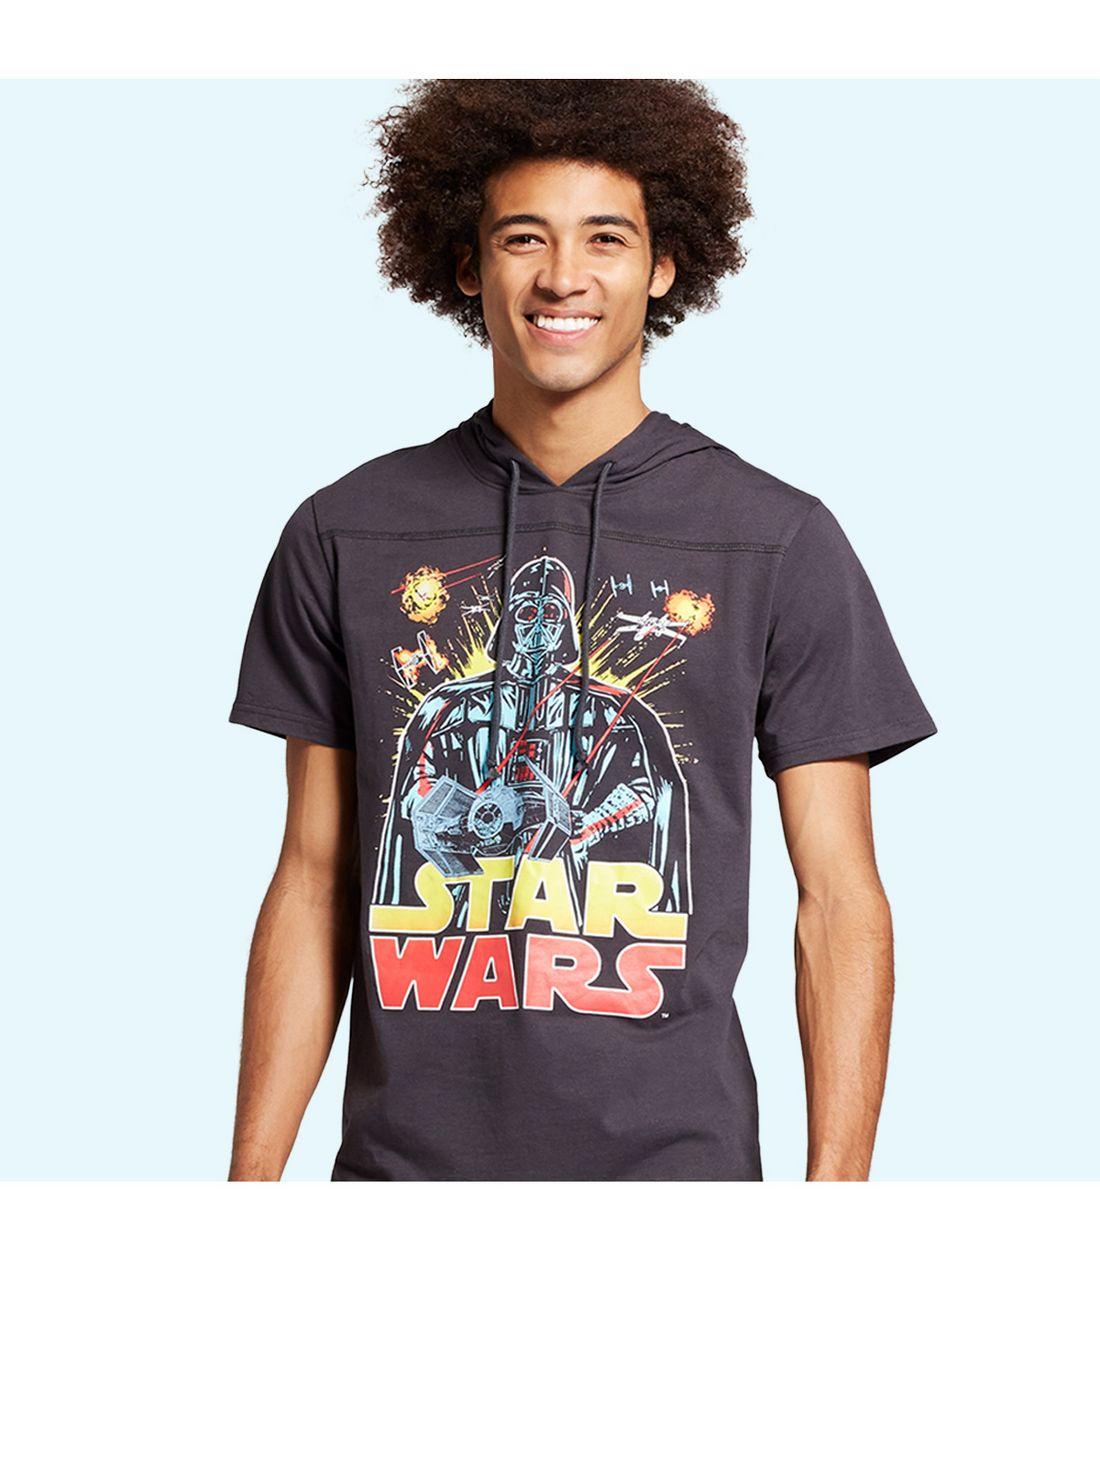 Men's Graphic T-Shirts : Target